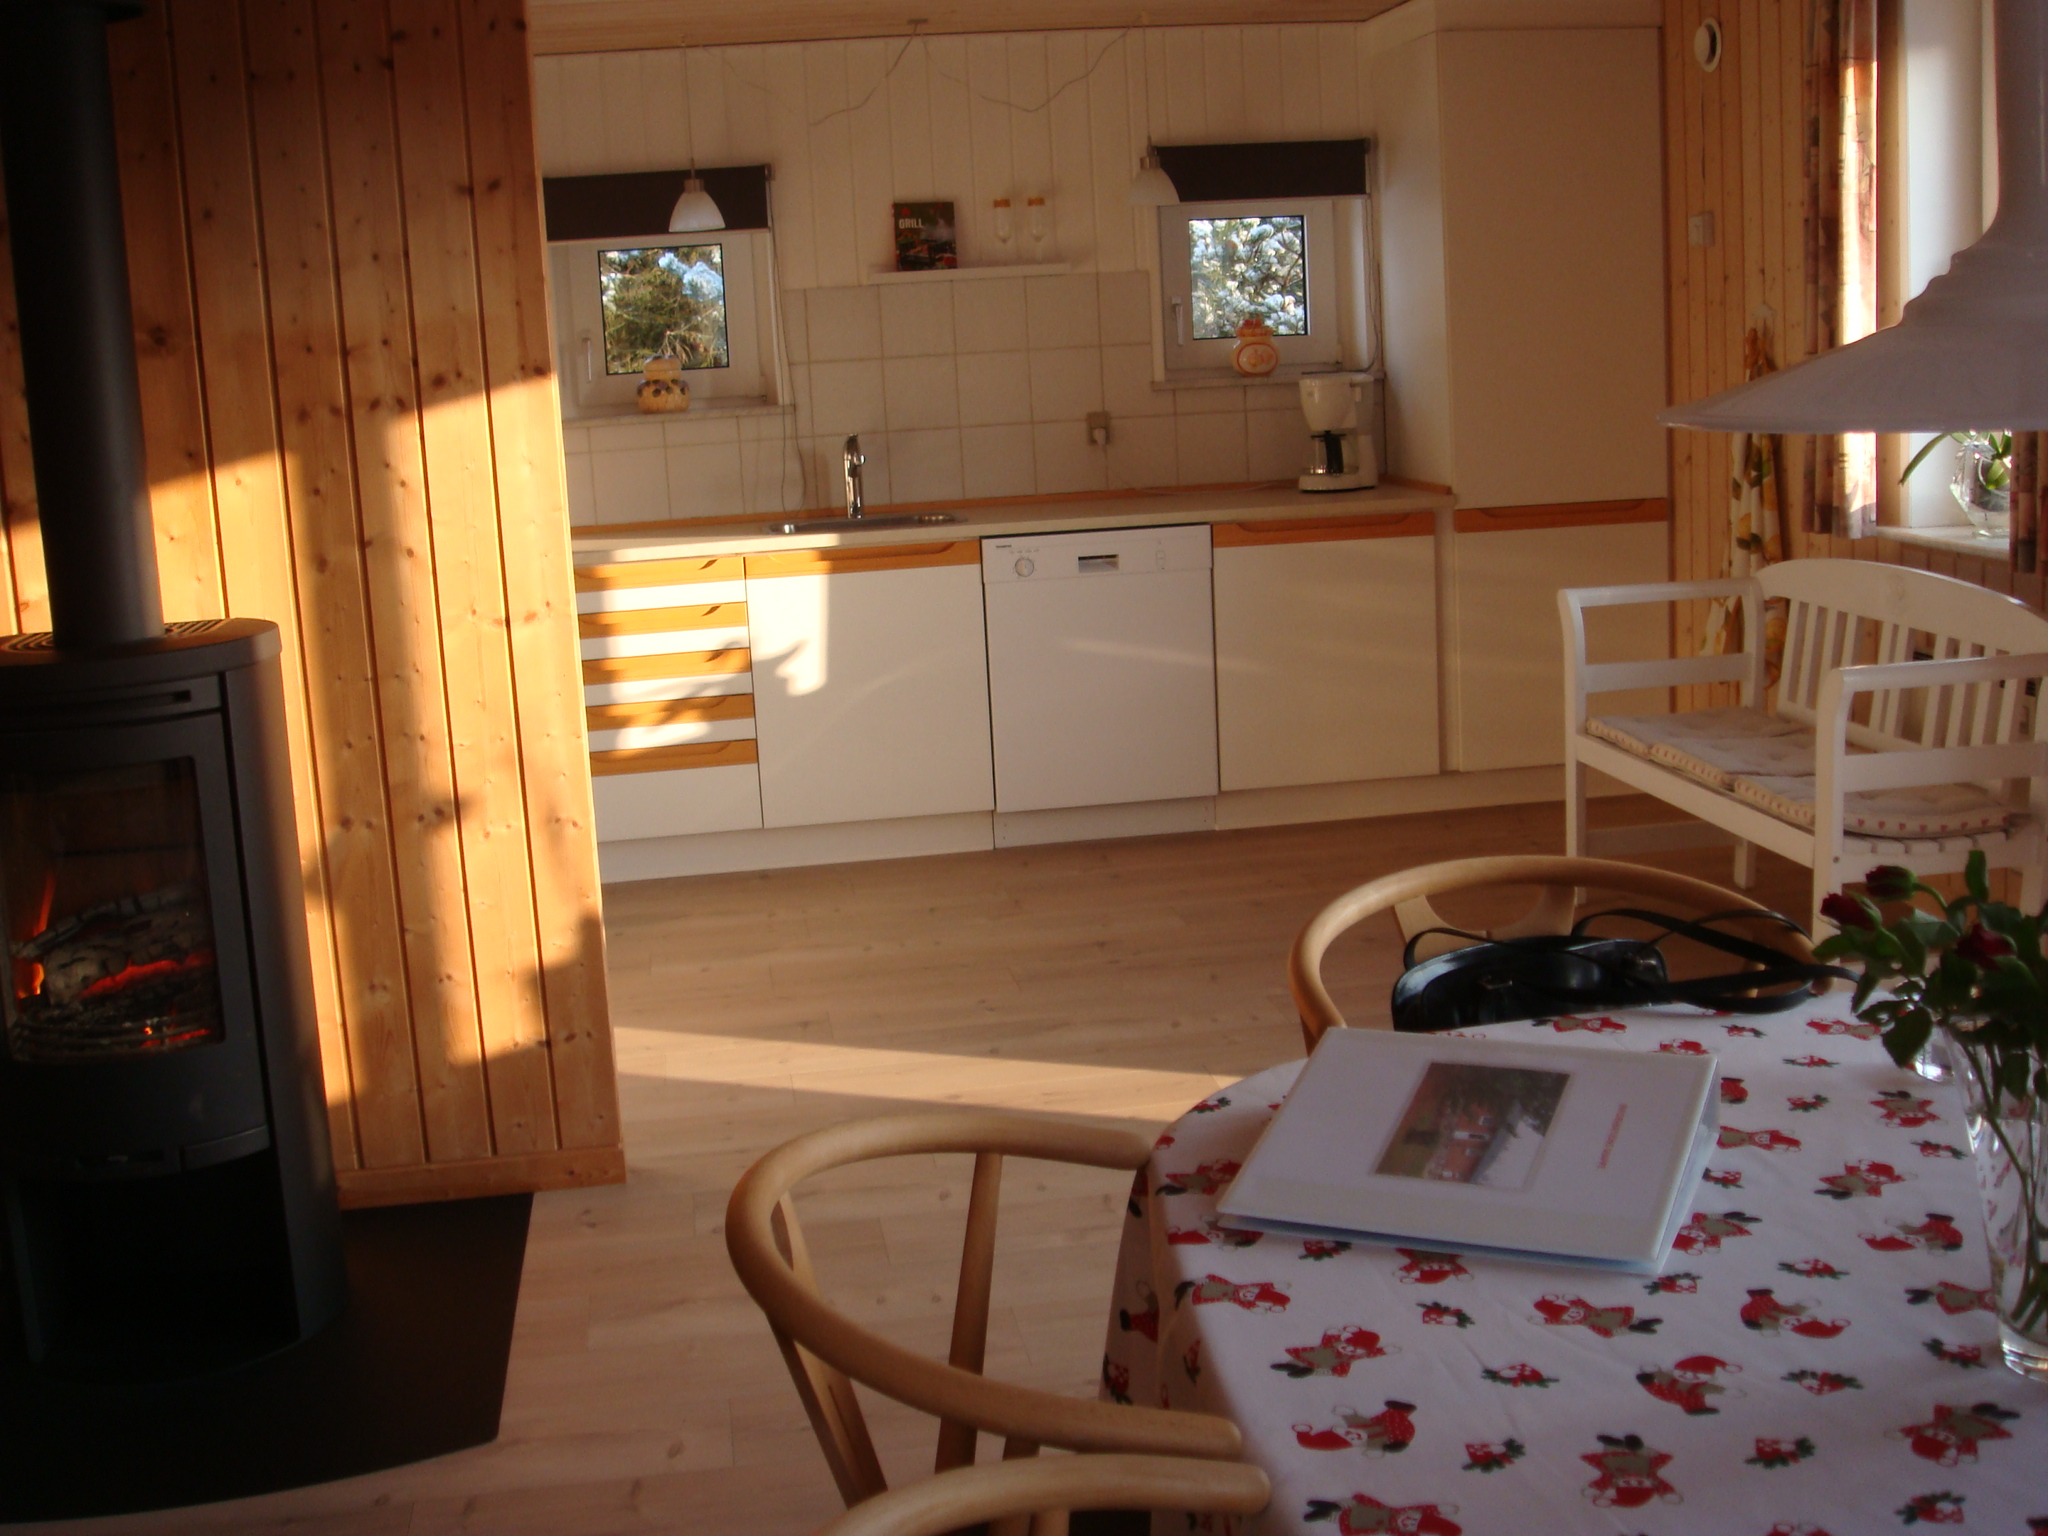 Ferienhaus 1184 - Hausfoto 3